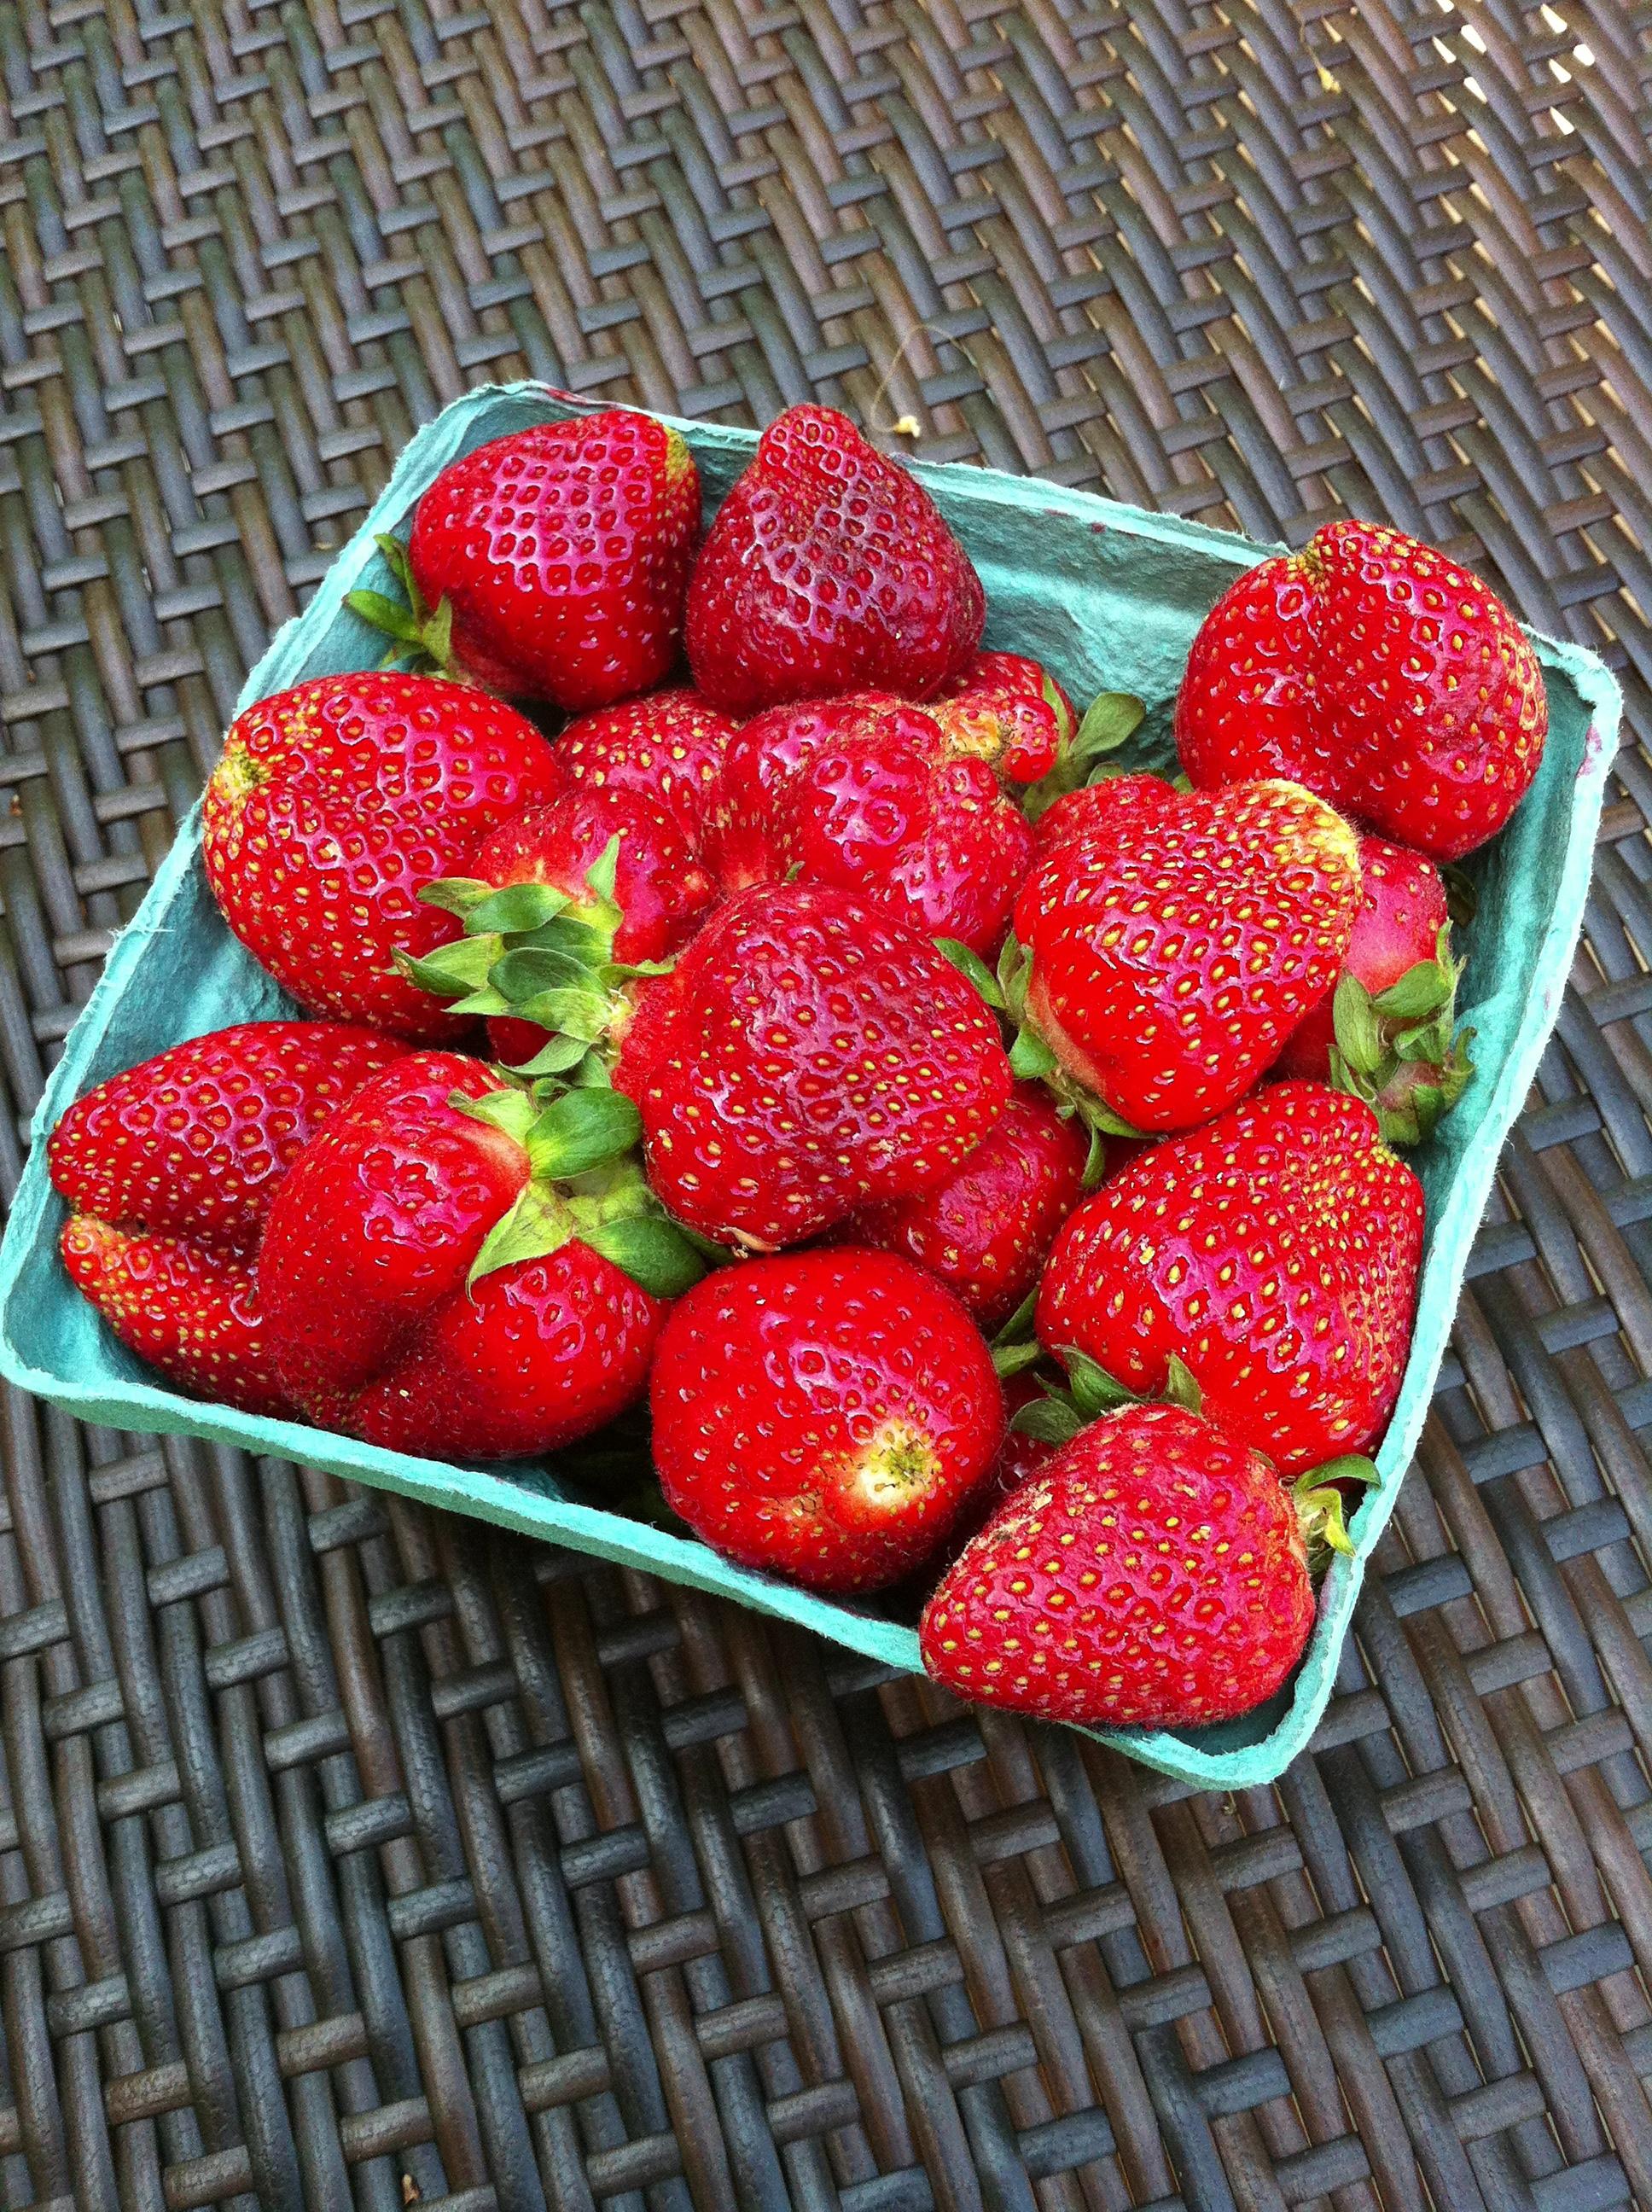 Beautiful local strawberries!